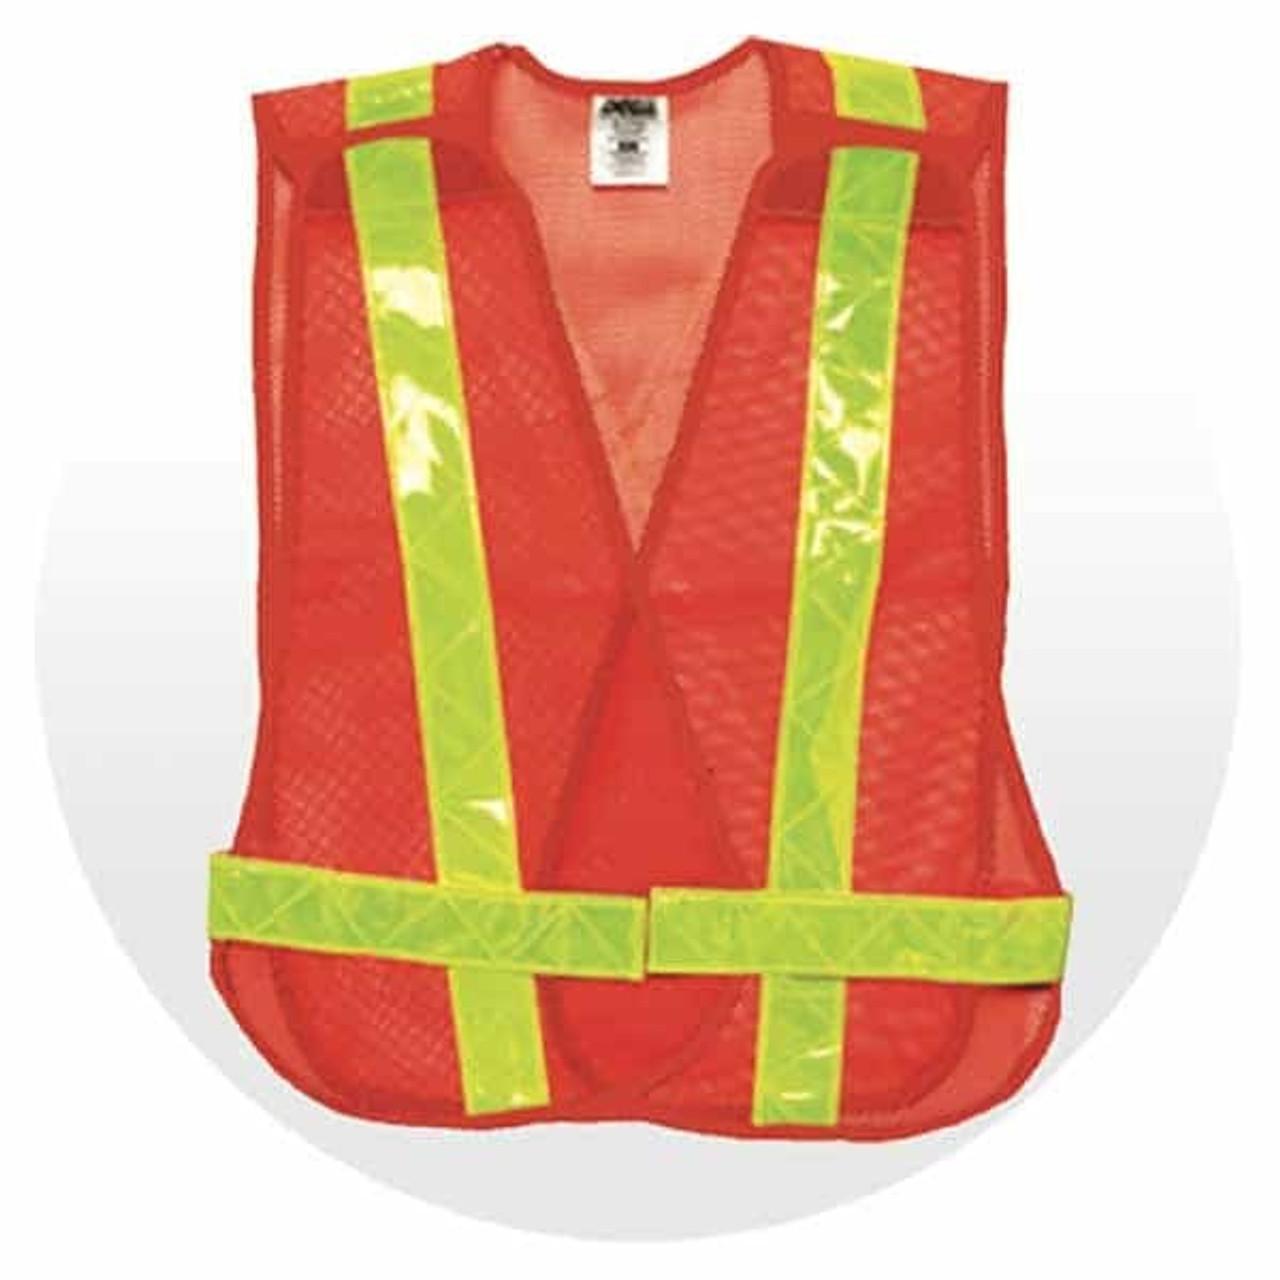 Reflective Safety Vests & T-Shirts